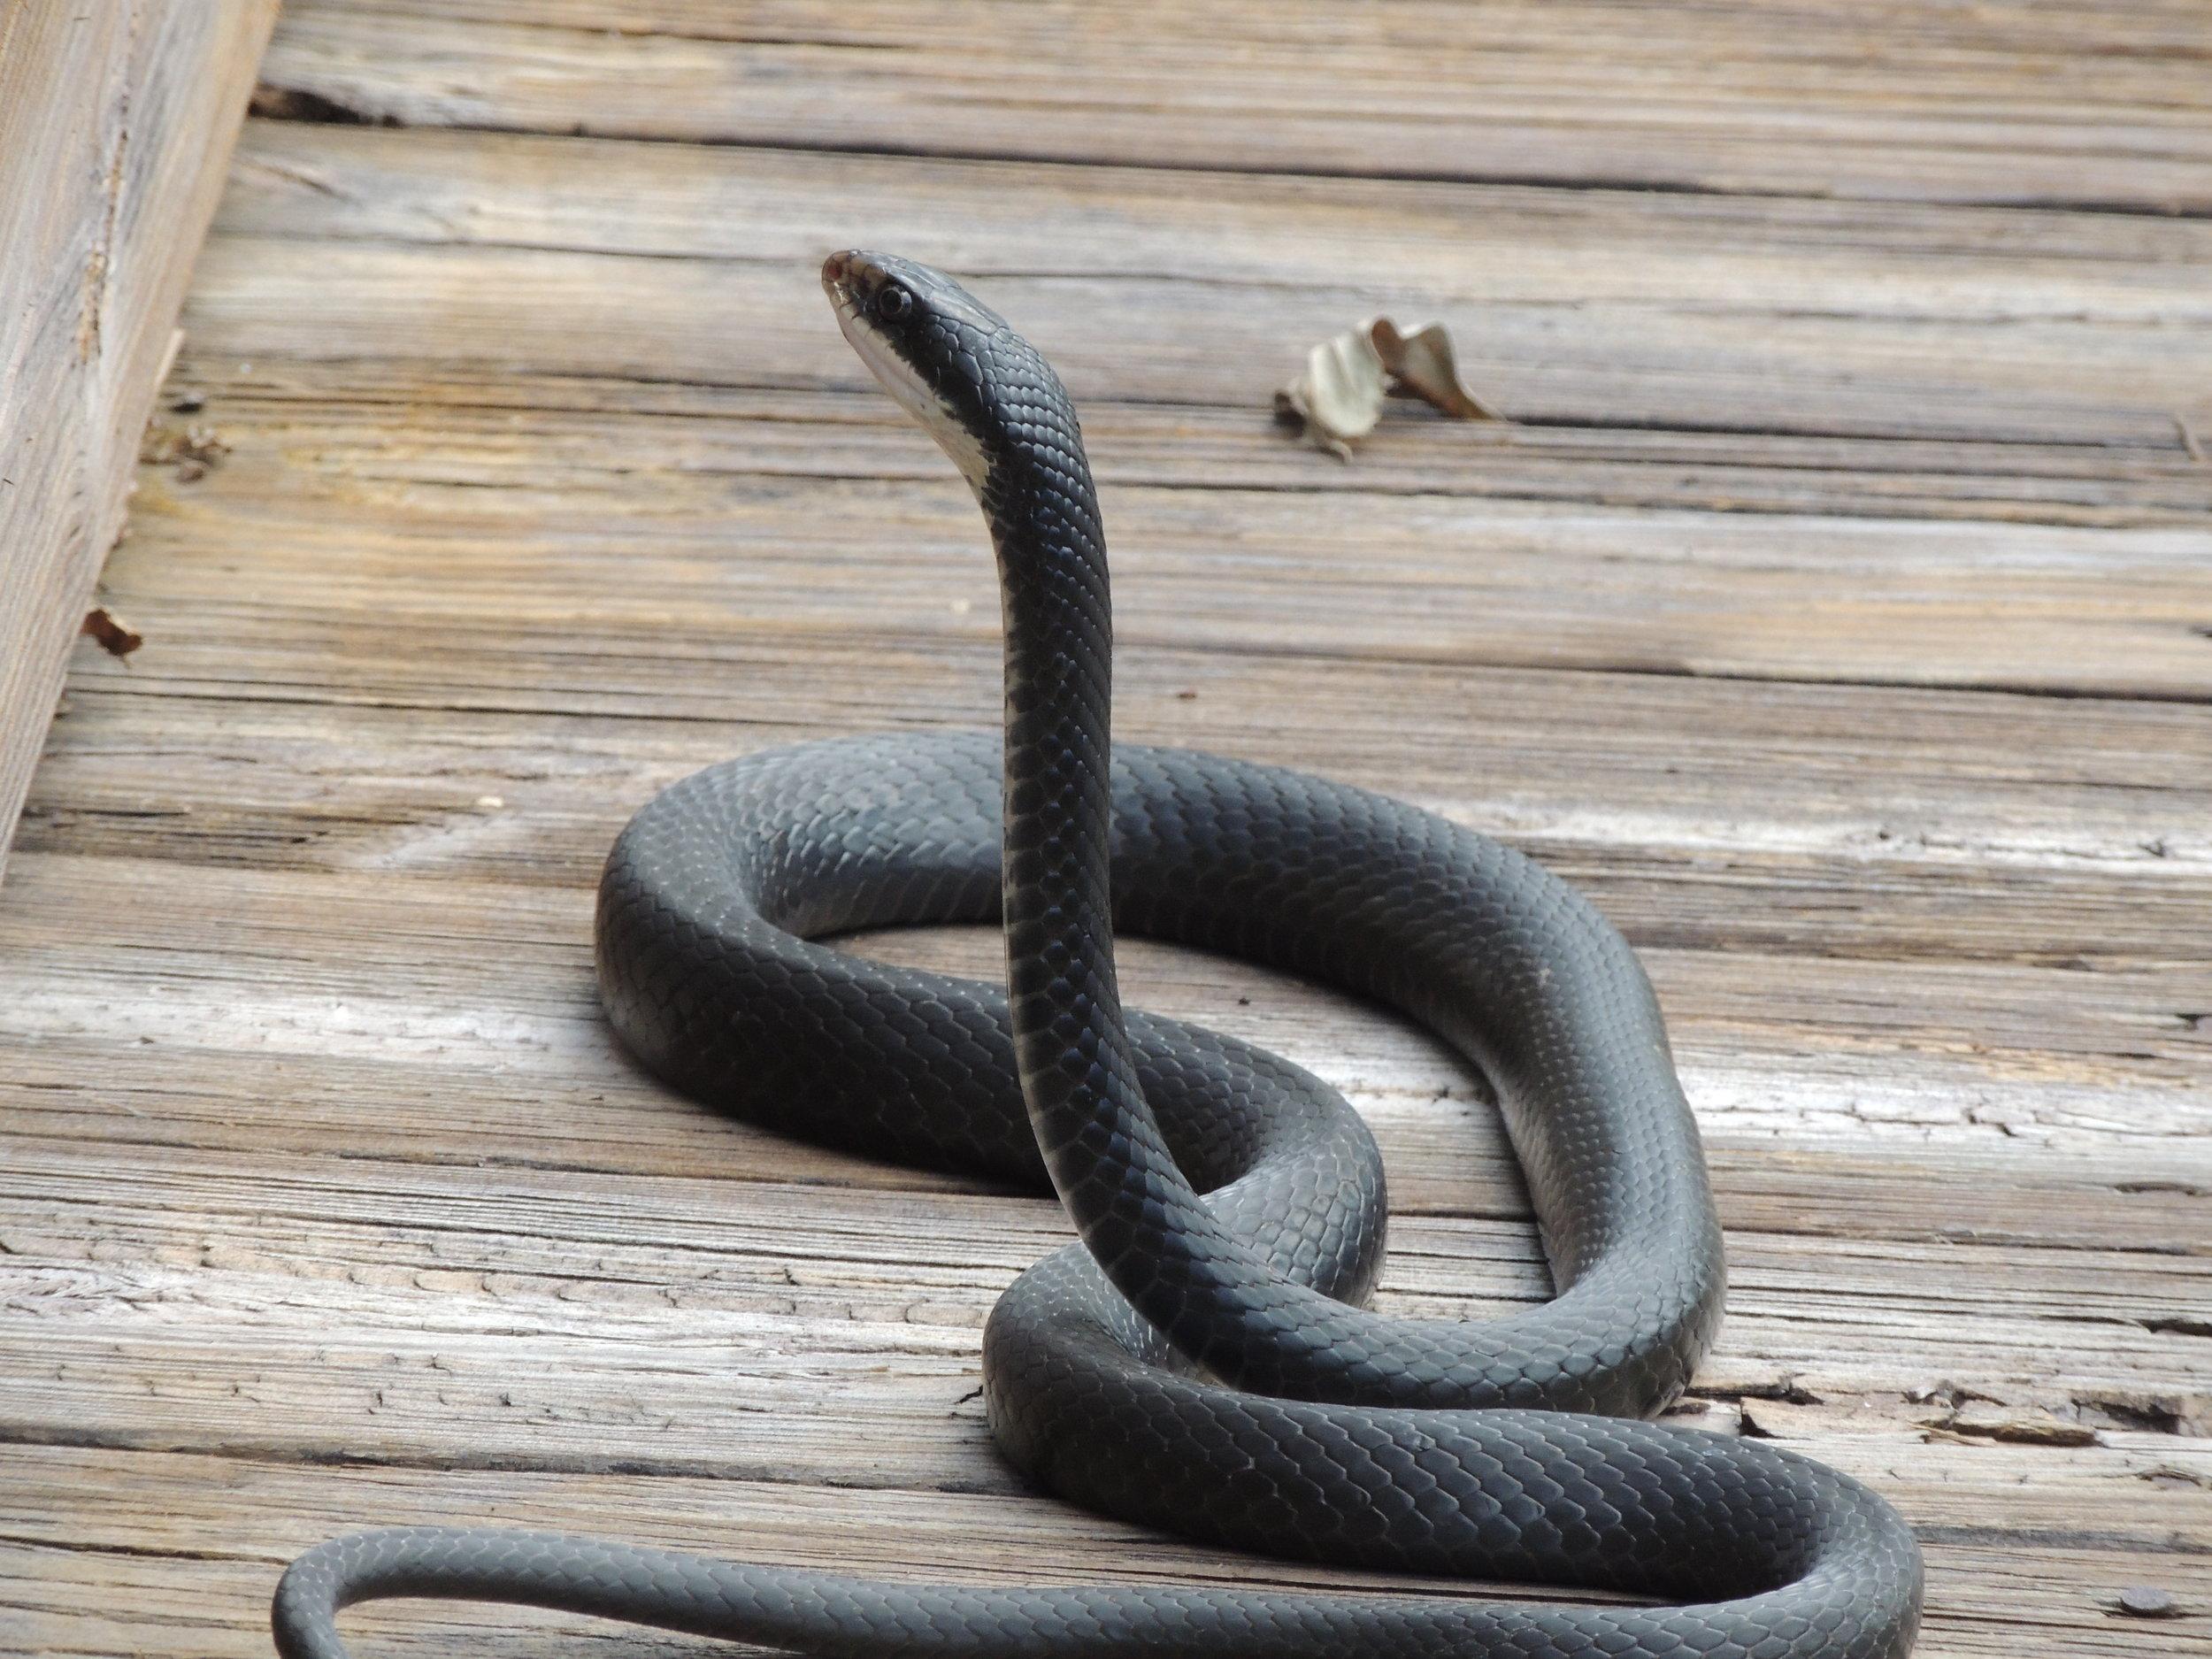 Black Racer Snake, Coluber constrictor priapus, on the boardwalk